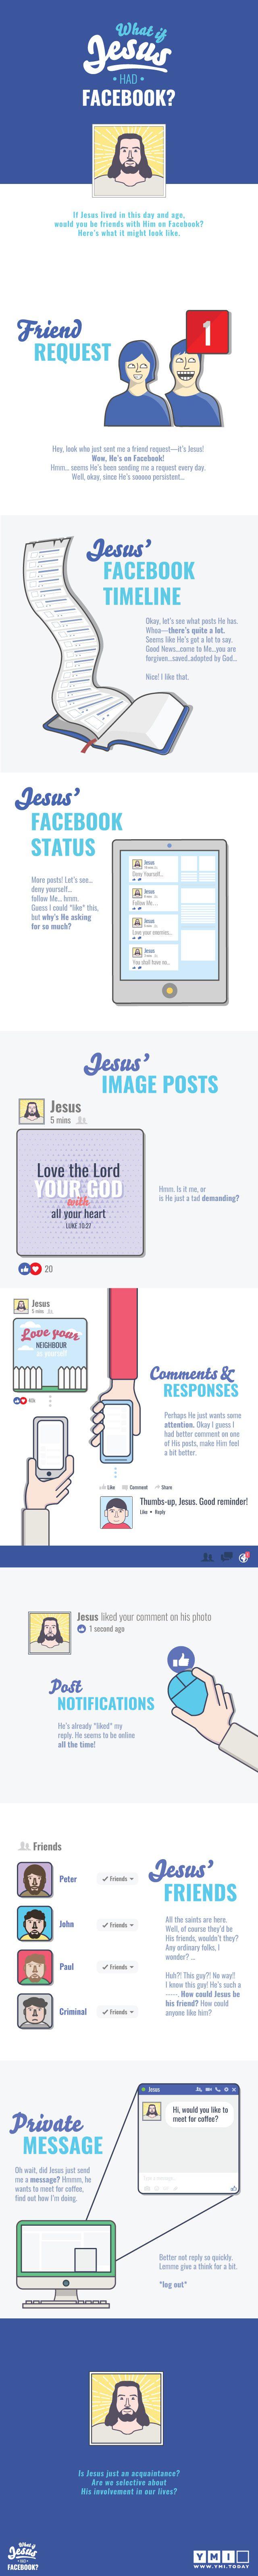 What-if-Jesus-had-facebook-(full-image)